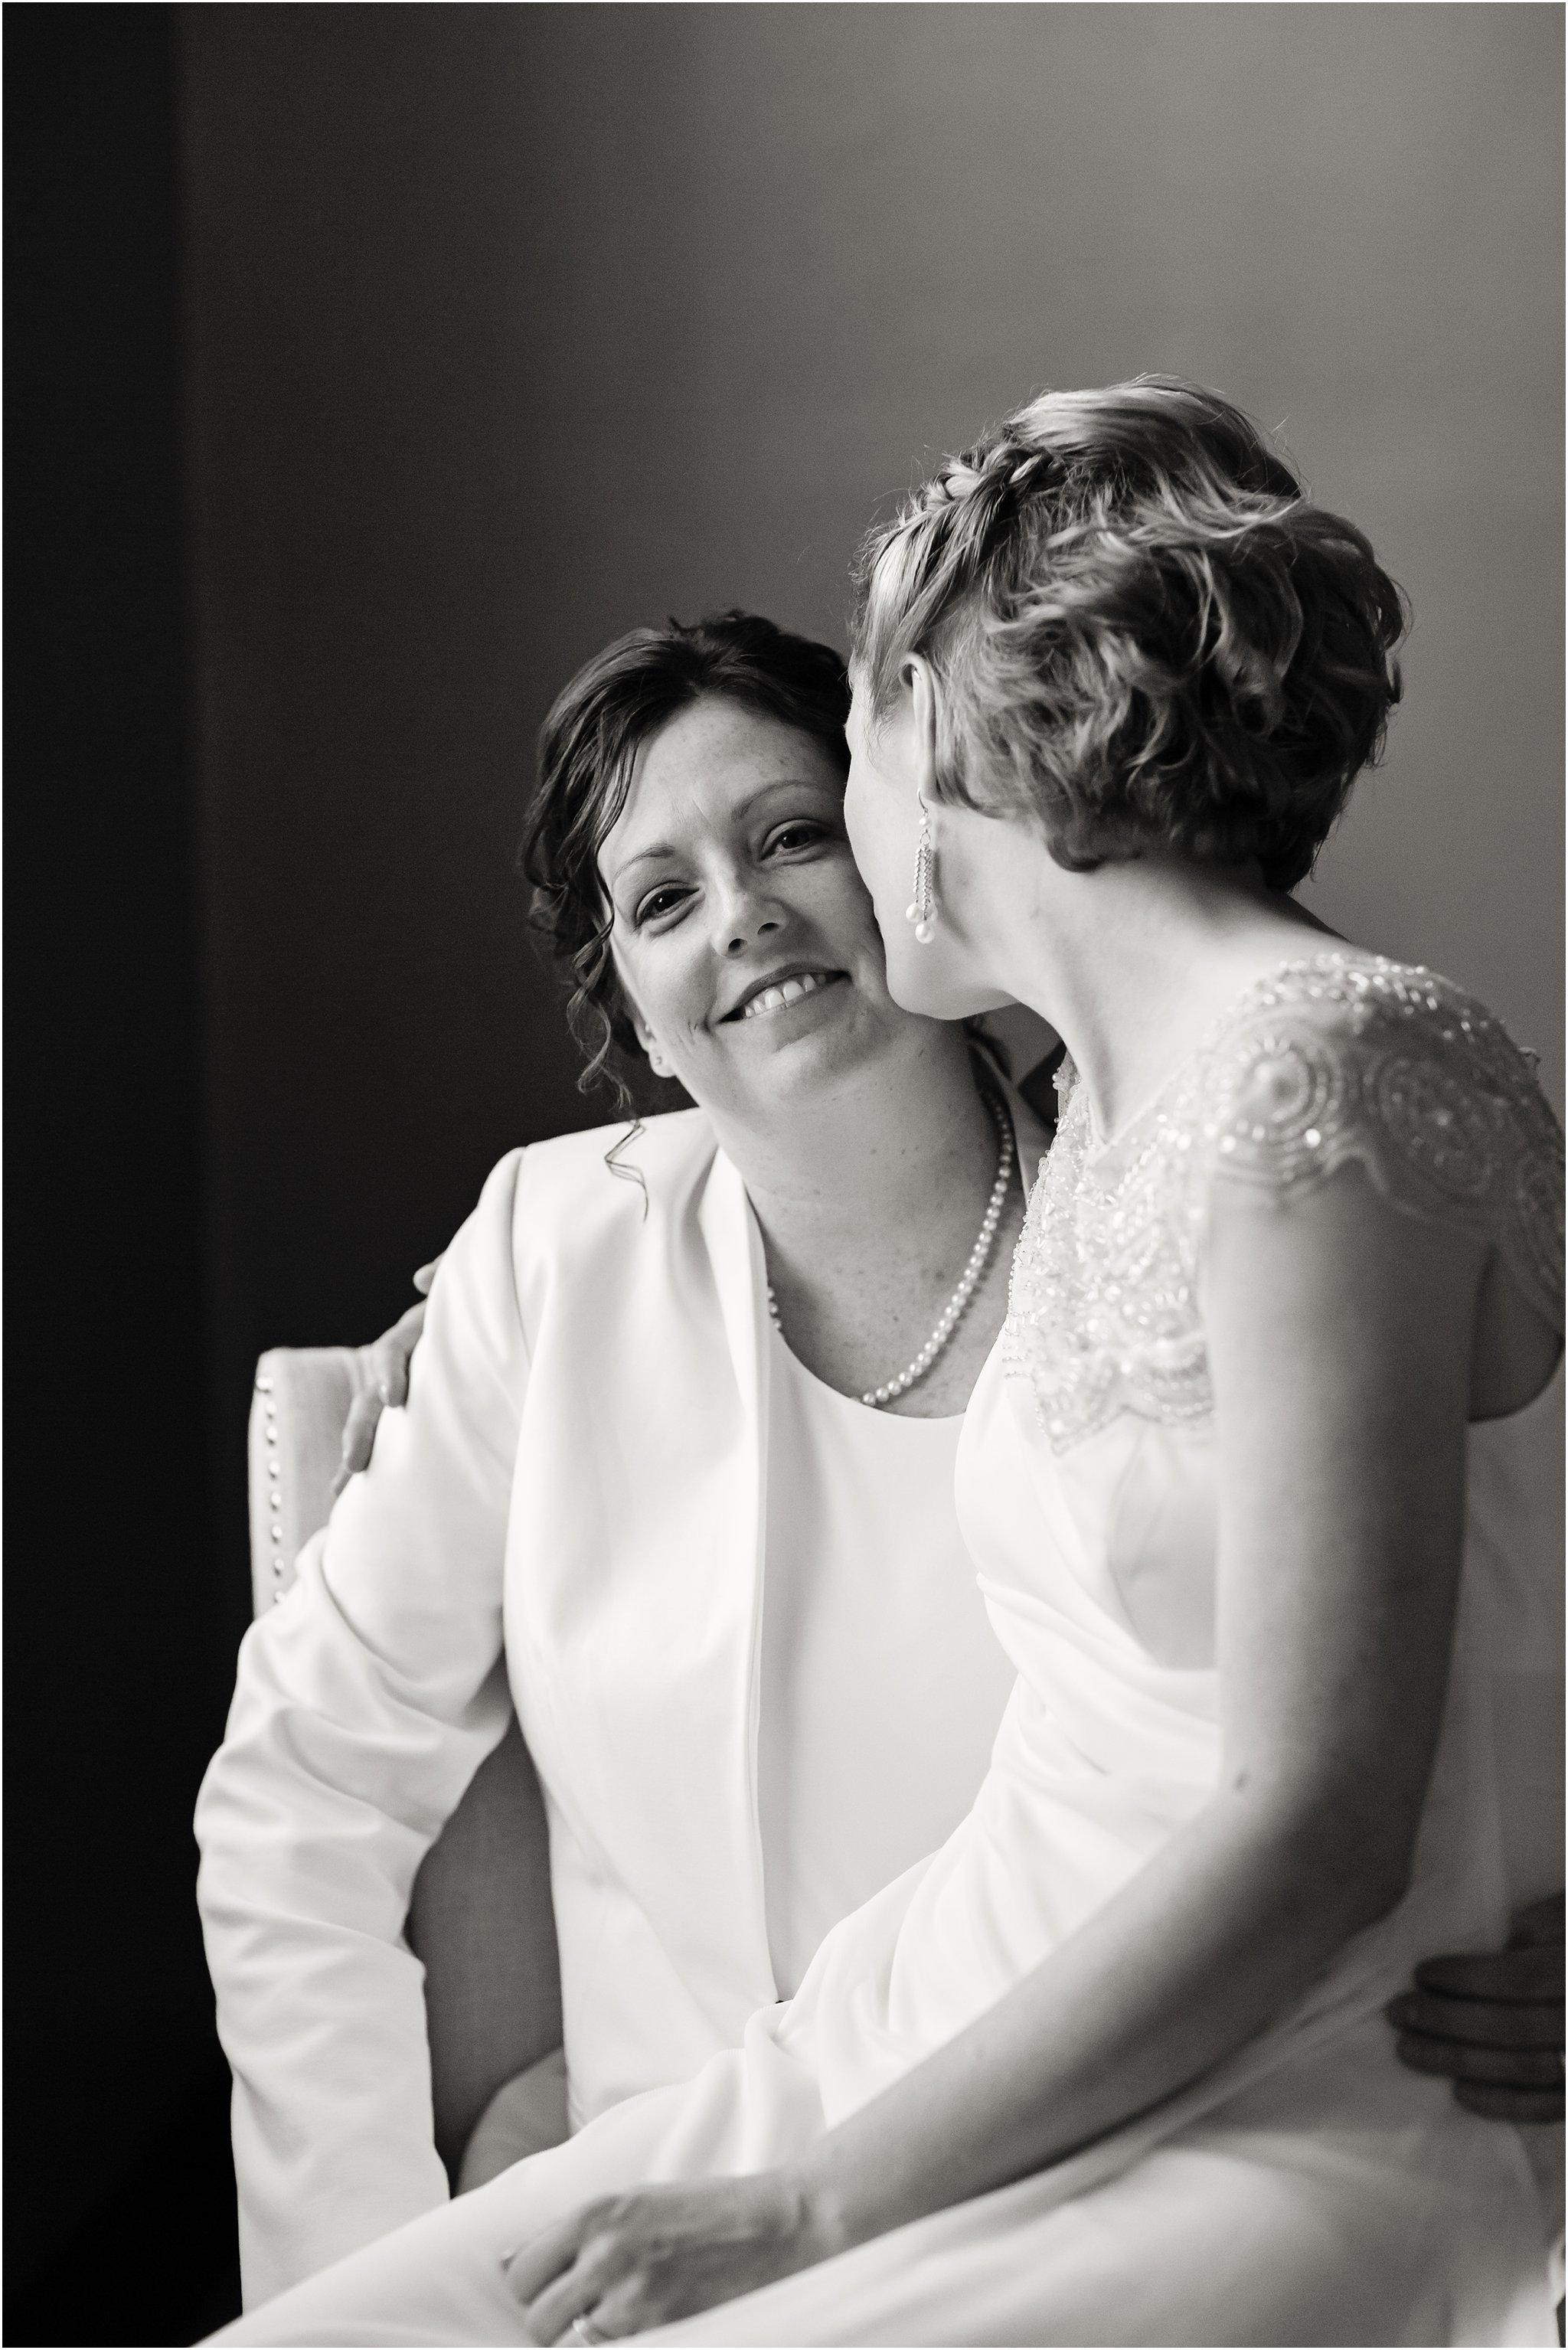 Black & White Portrait of Two Brides